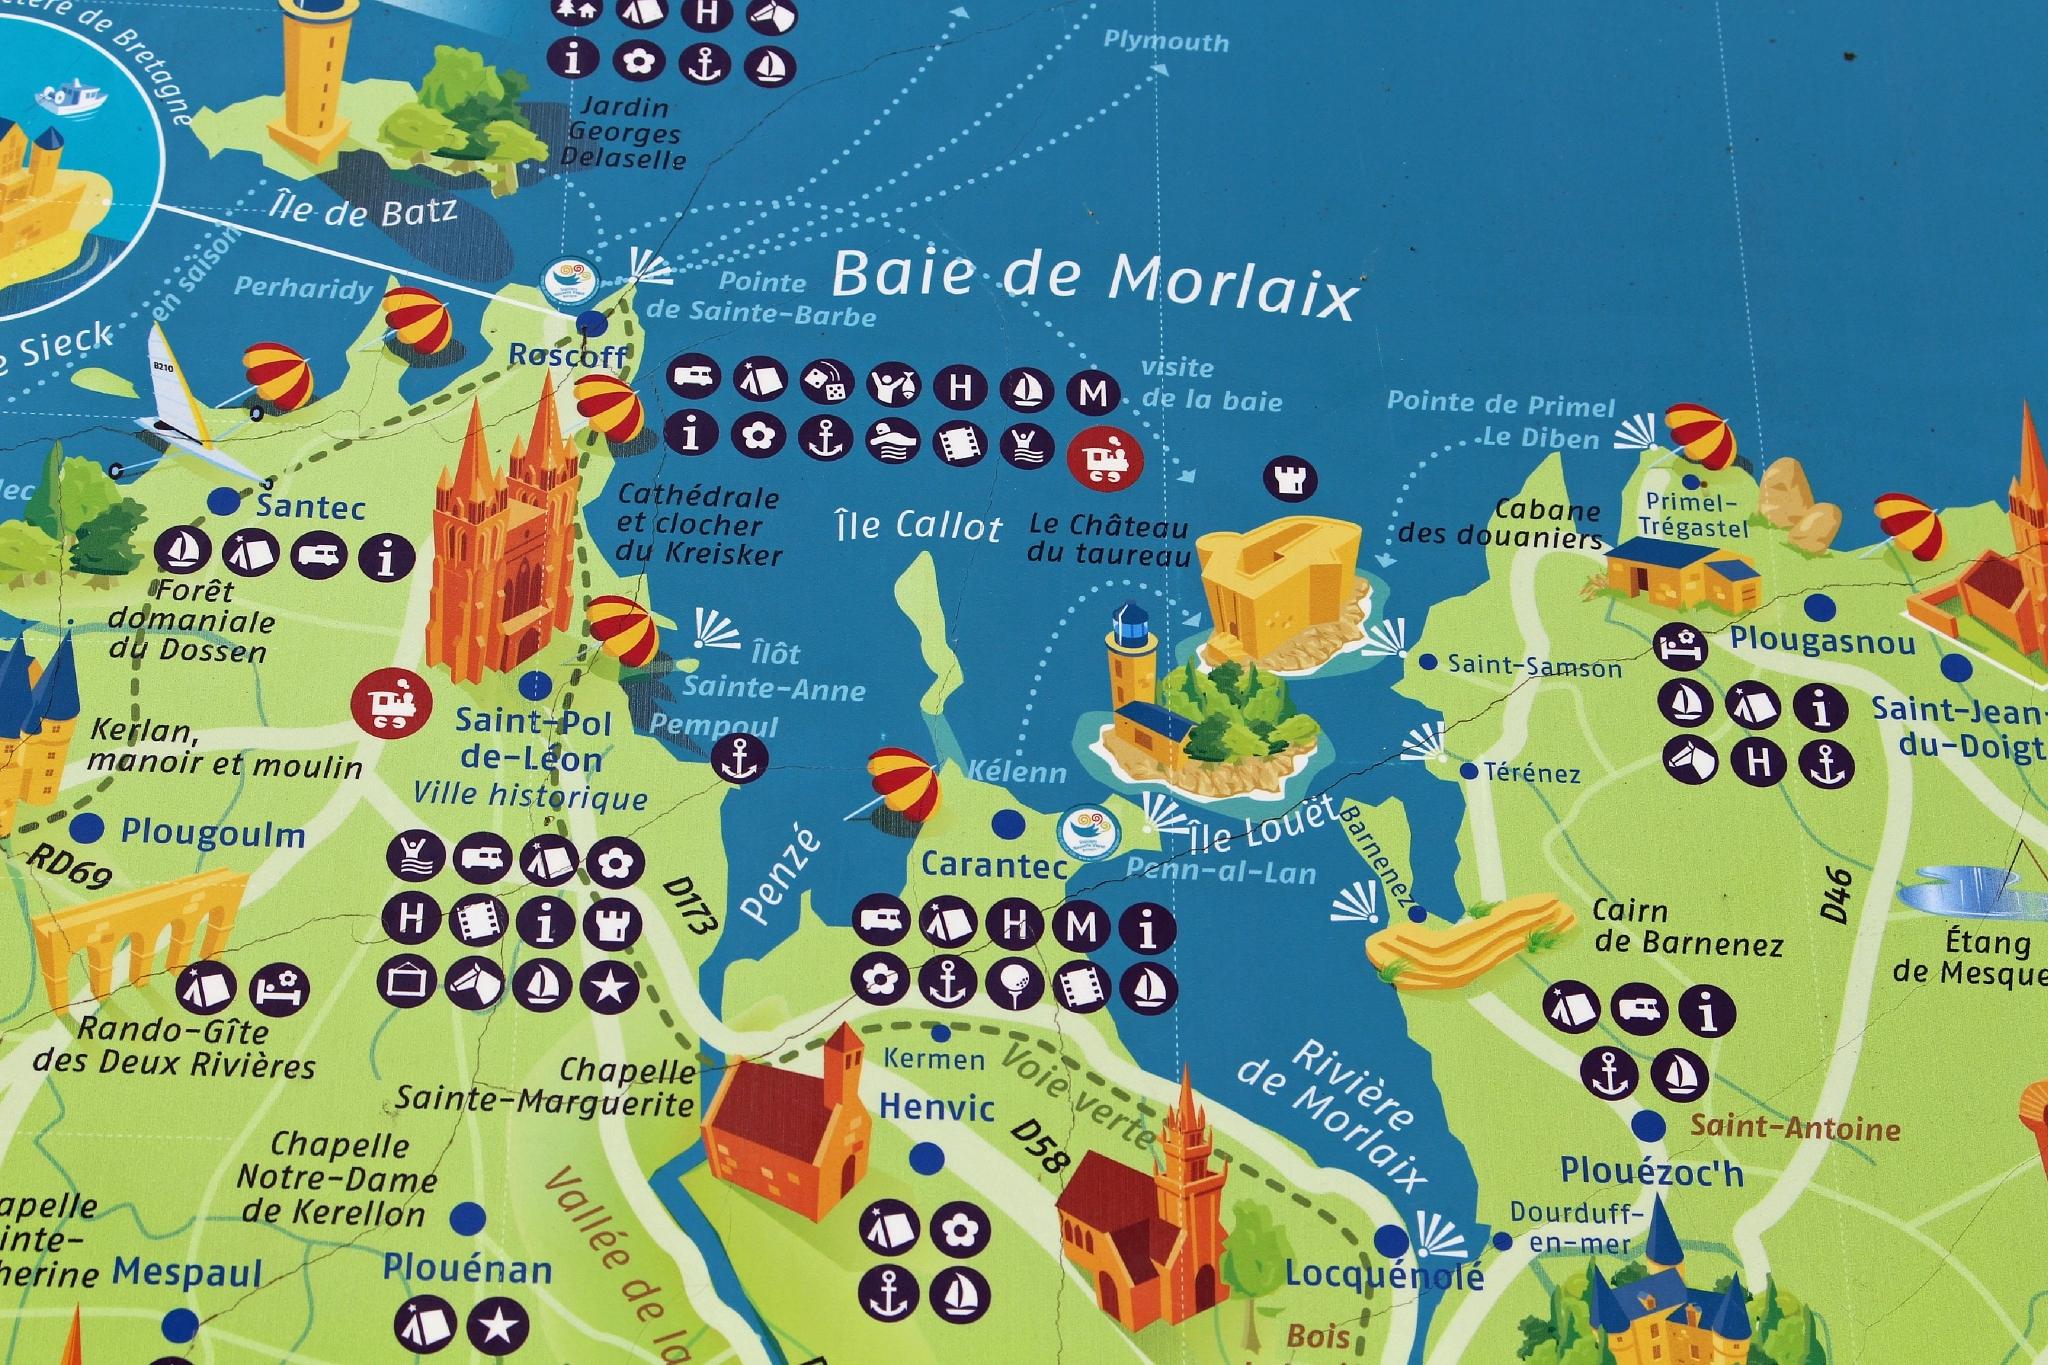 baie de morlaix carte 001   carte de la baie de Morlaix   Photo de 010   Roscoff